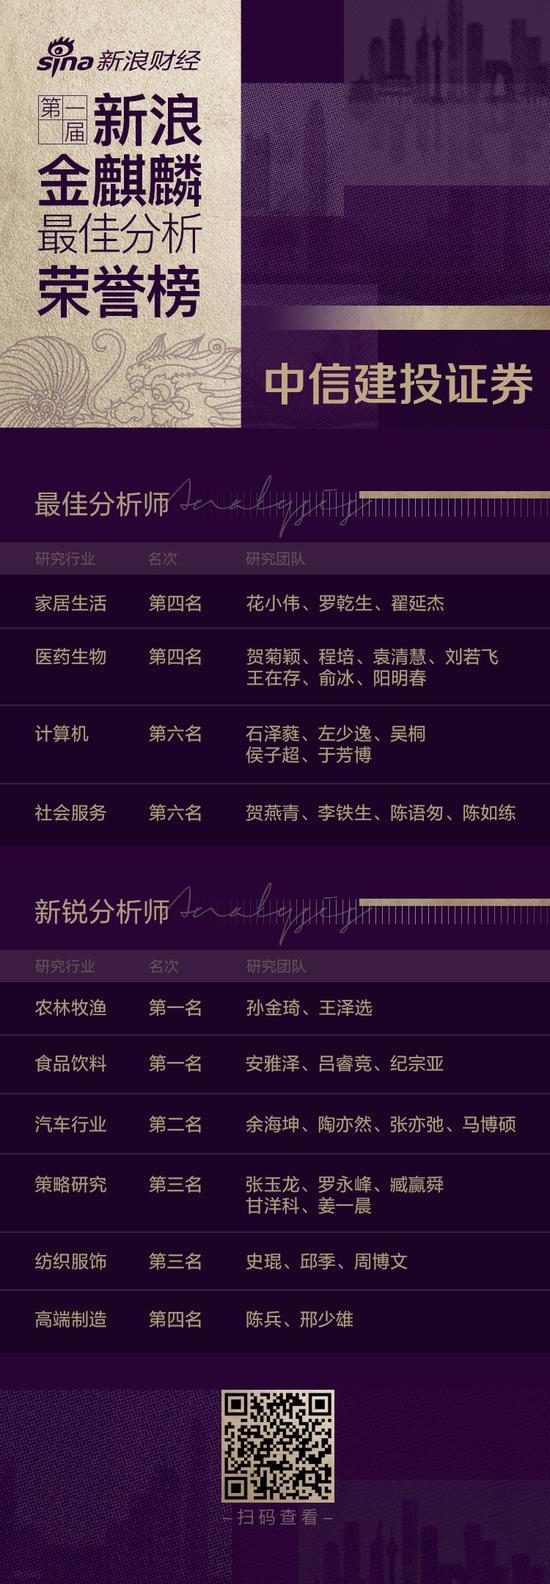 im体育苹果,浙江温州也有一片低调的梯田,已有一千多年,免费开放